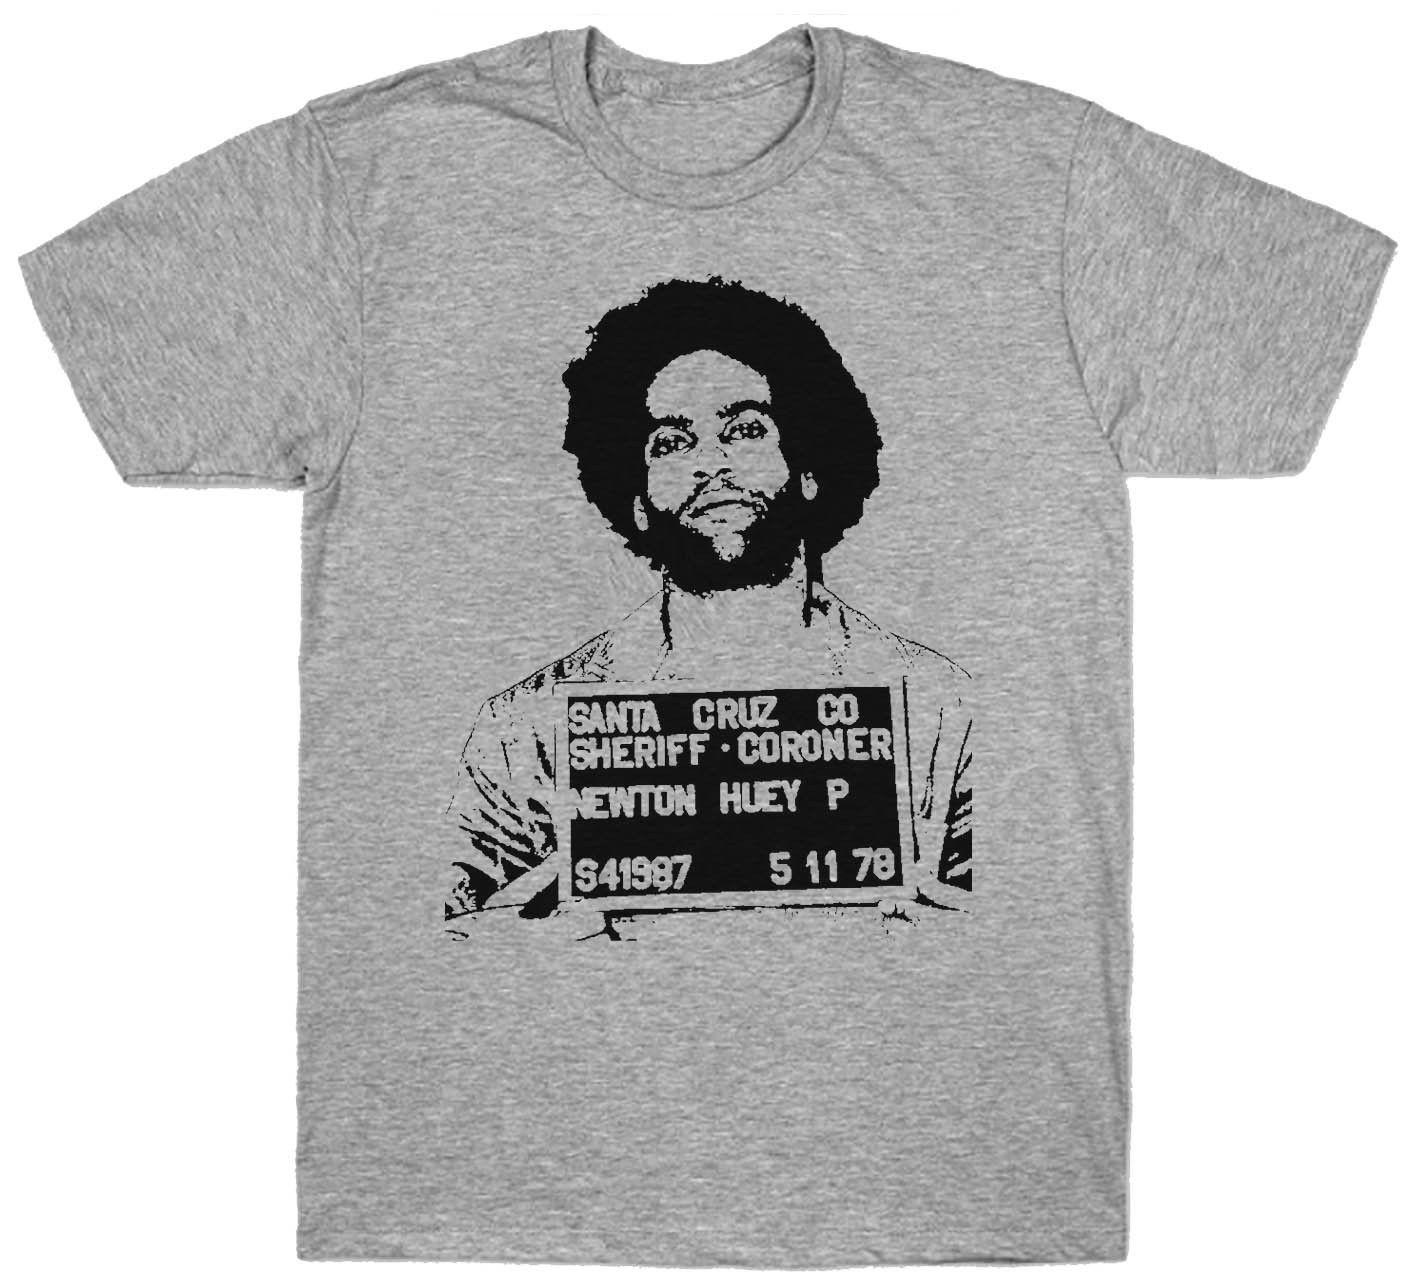 Huey P Newton Mugshot T Shirt Political Activist 1960 S Black Panther Party